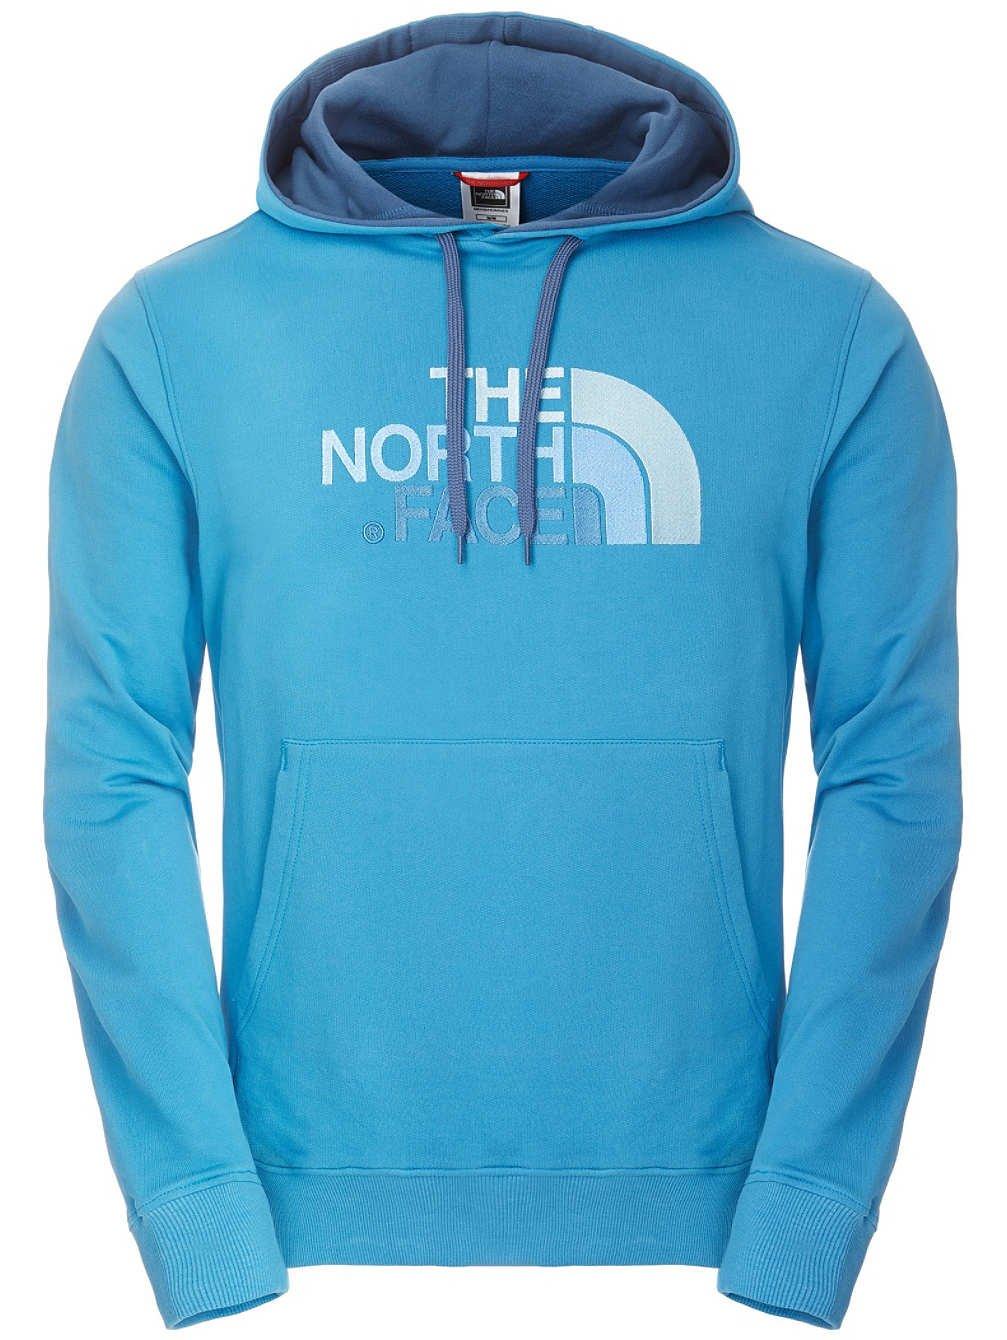 THE NORTH FACE Drew Peak Pullover/Hoodie